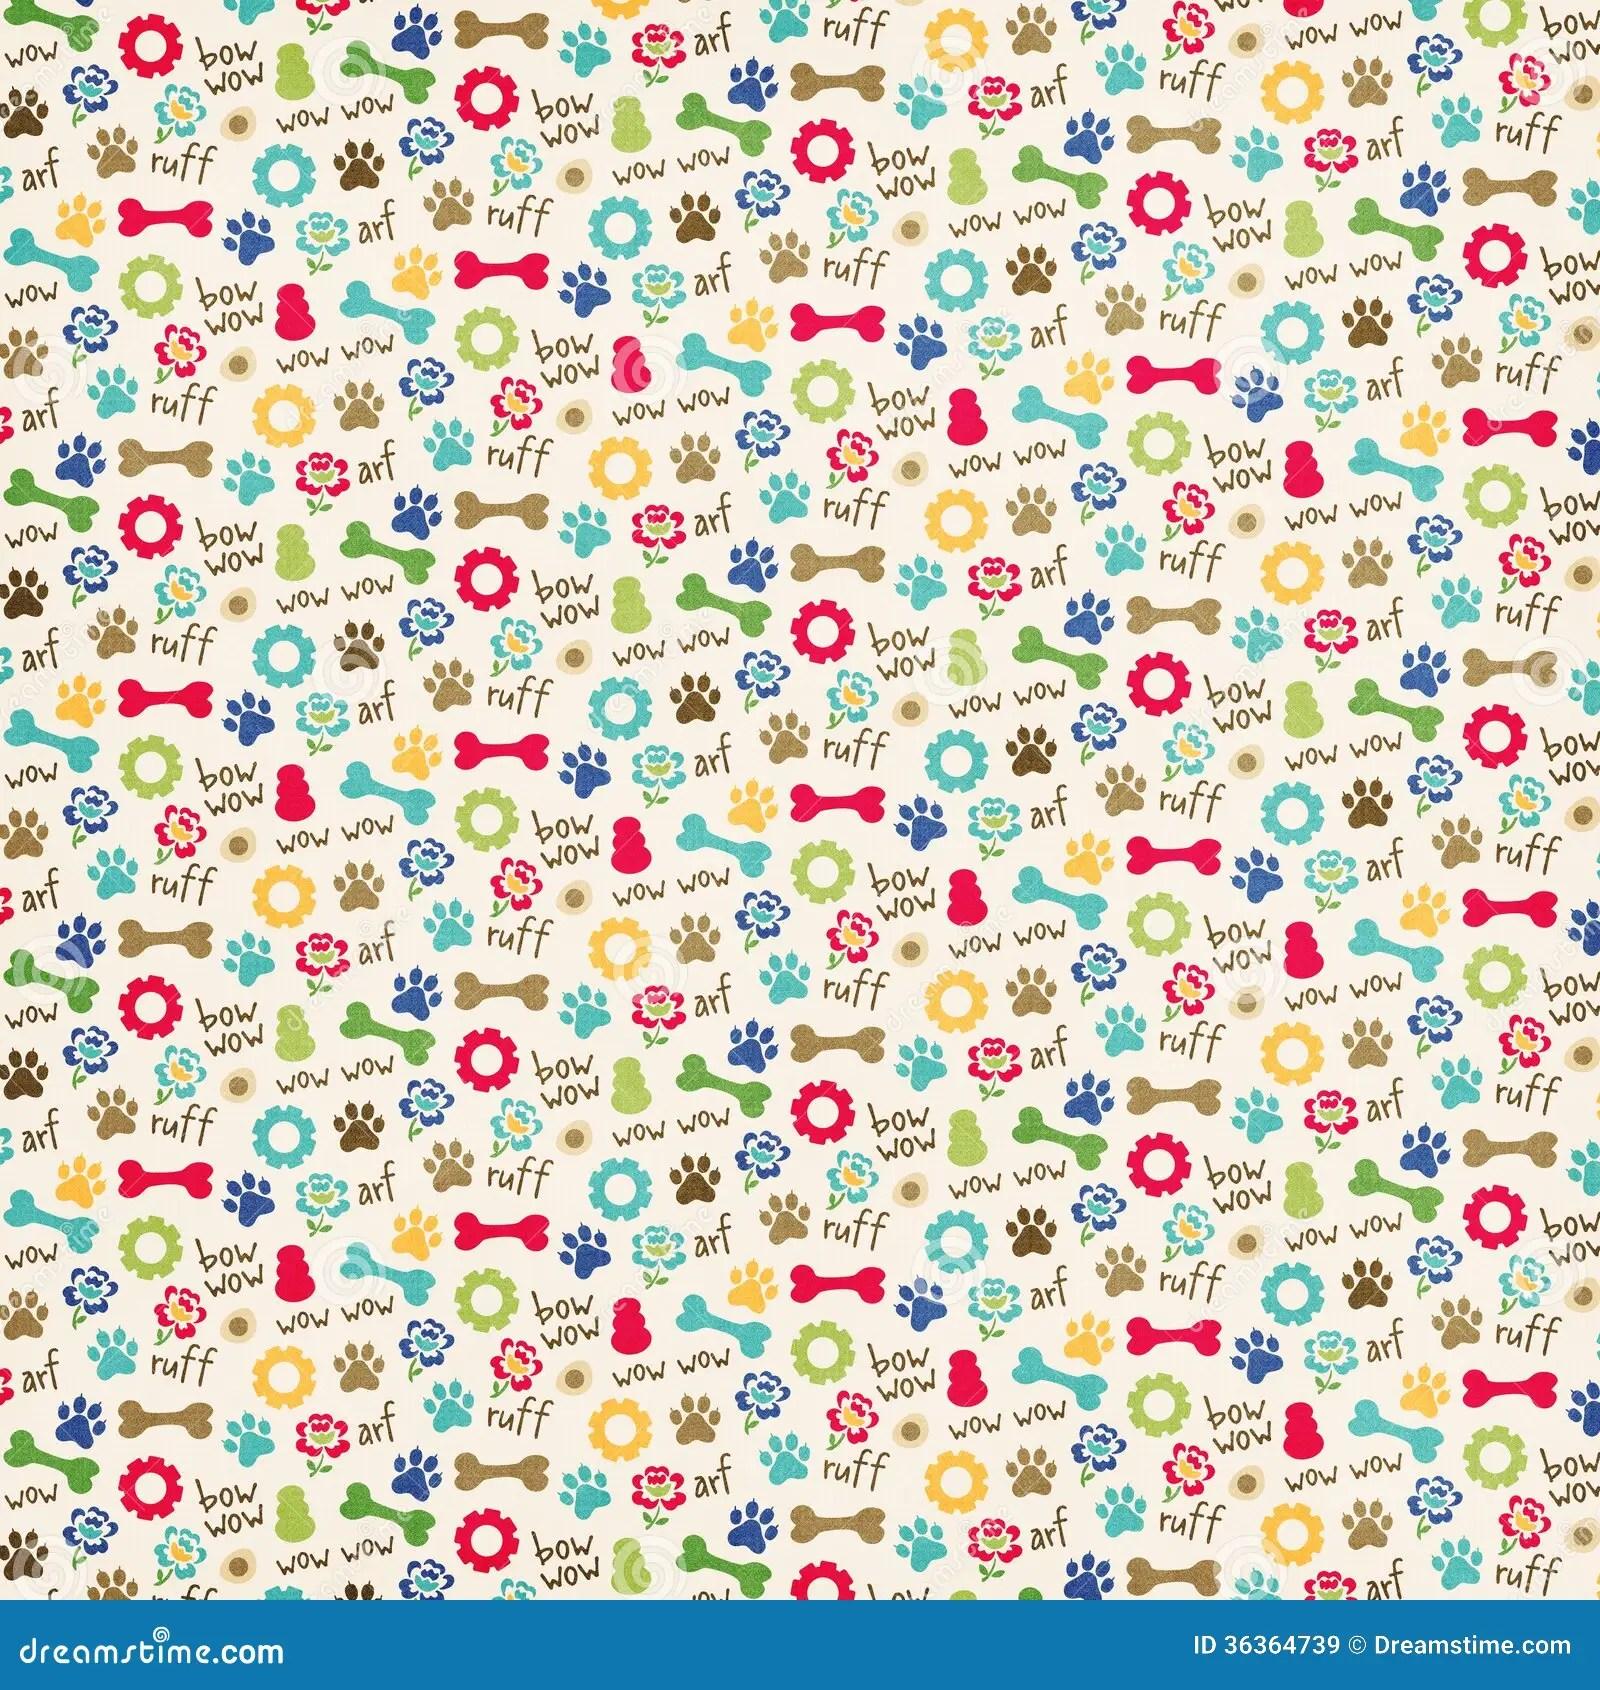 Cute Paw Print Wallpaper Dog Themed Pattern Stock Illustration Illustration Of